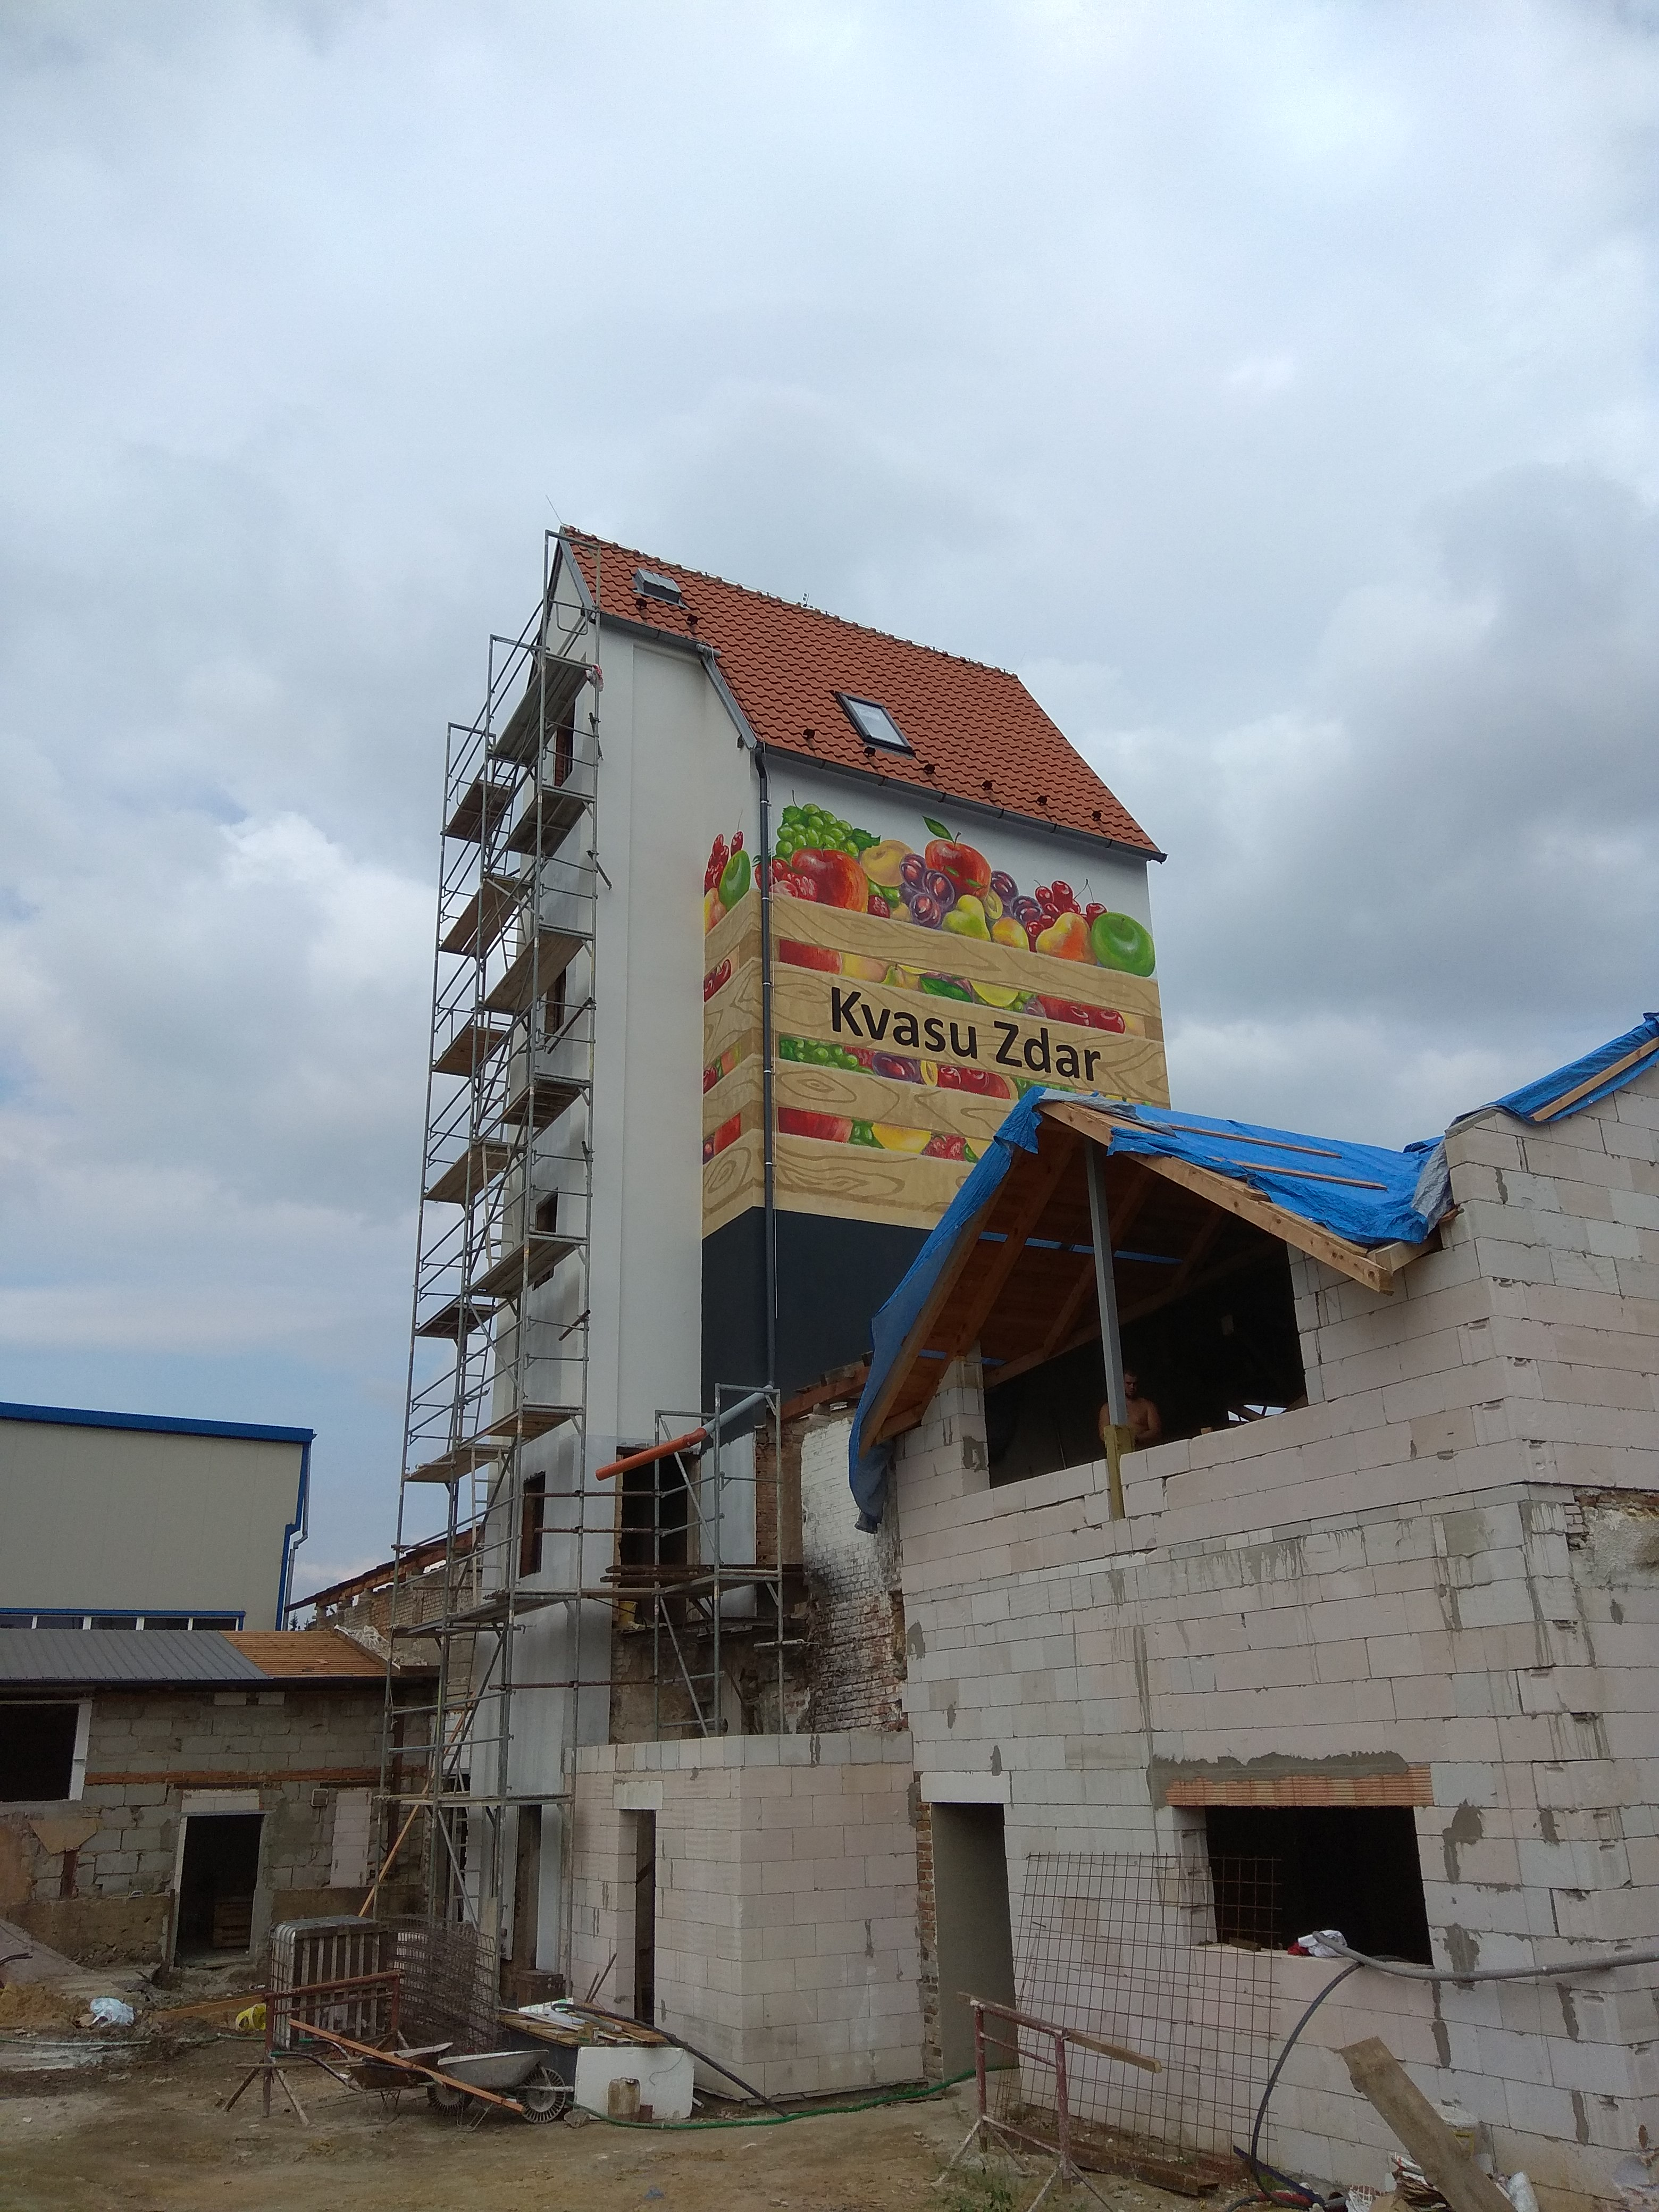 stavba kvasu zdar